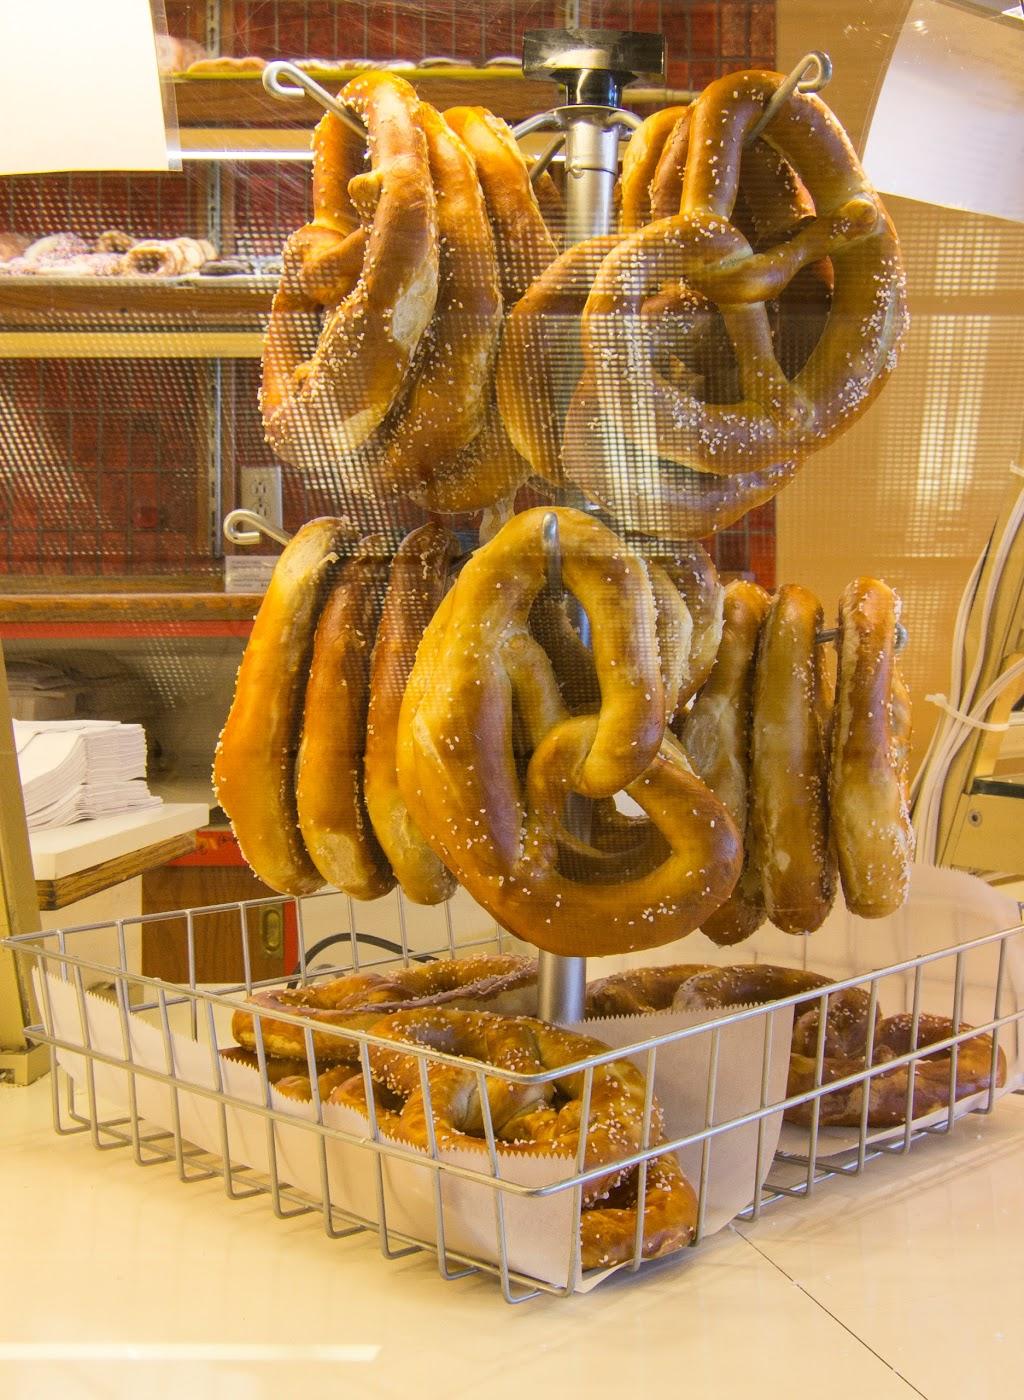 Servatii Pastry Shop Blue Ash - bakery    Photo 9 of 10   Address: 9525 Kenwood Rd, Cincinnati, OH 45242, USA   Phone: (513) 791-3013